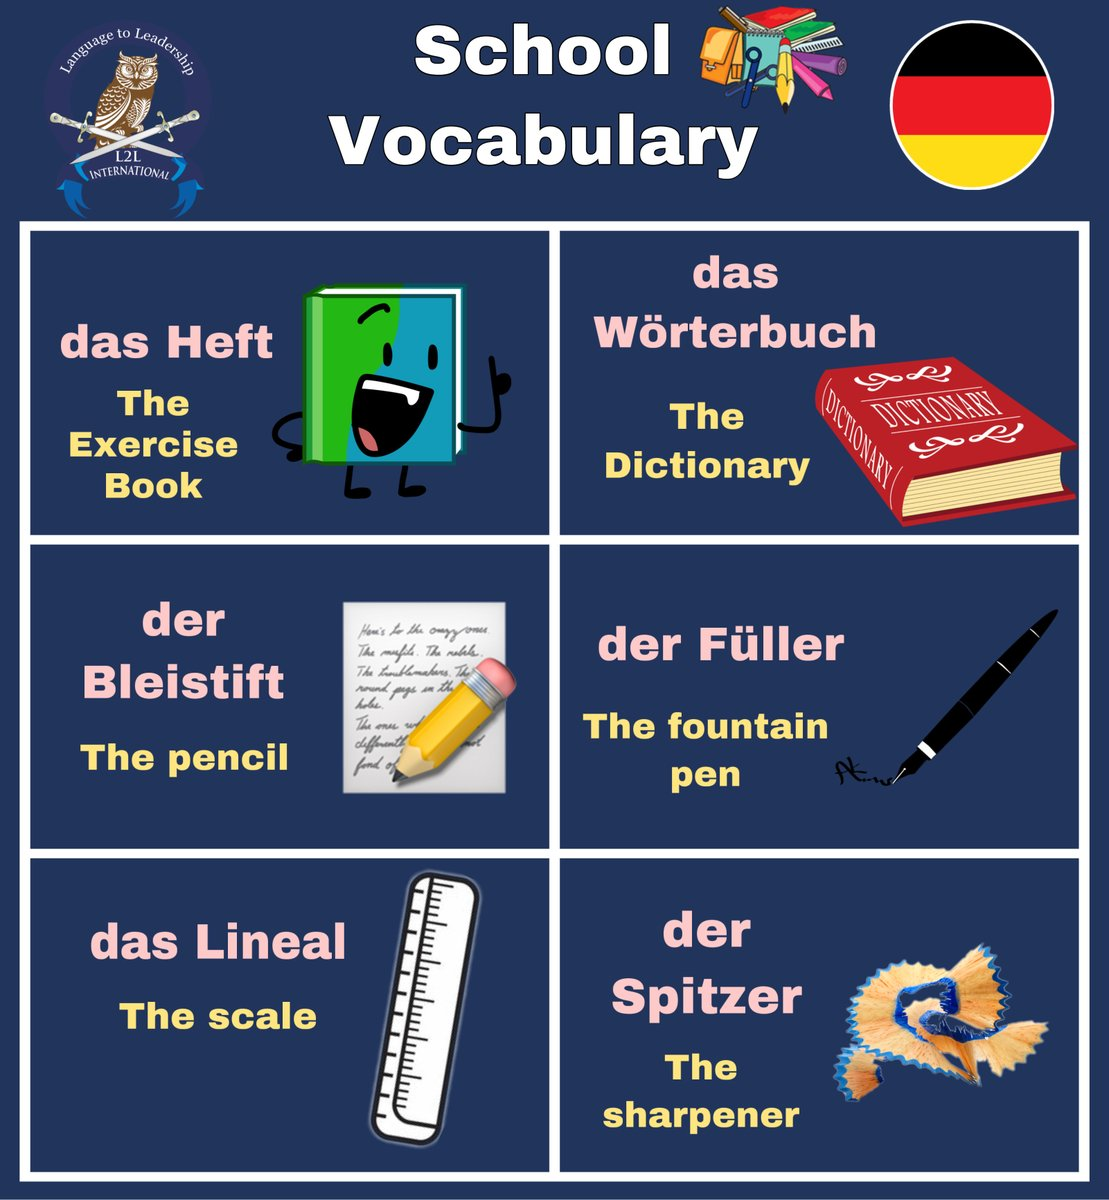 Learn School Vocabulary in German Language! #vocabulary #school #germanvocabulary #pencil #book #dictionary #pen #scale #sharpener #germangrammar #german #germany #germanlanguage #language #europe #germanoftheday #germanword #grammar #wortschatz #deutschlernen #deutschesprachepic.twitter.com/wtbDcNVmdi